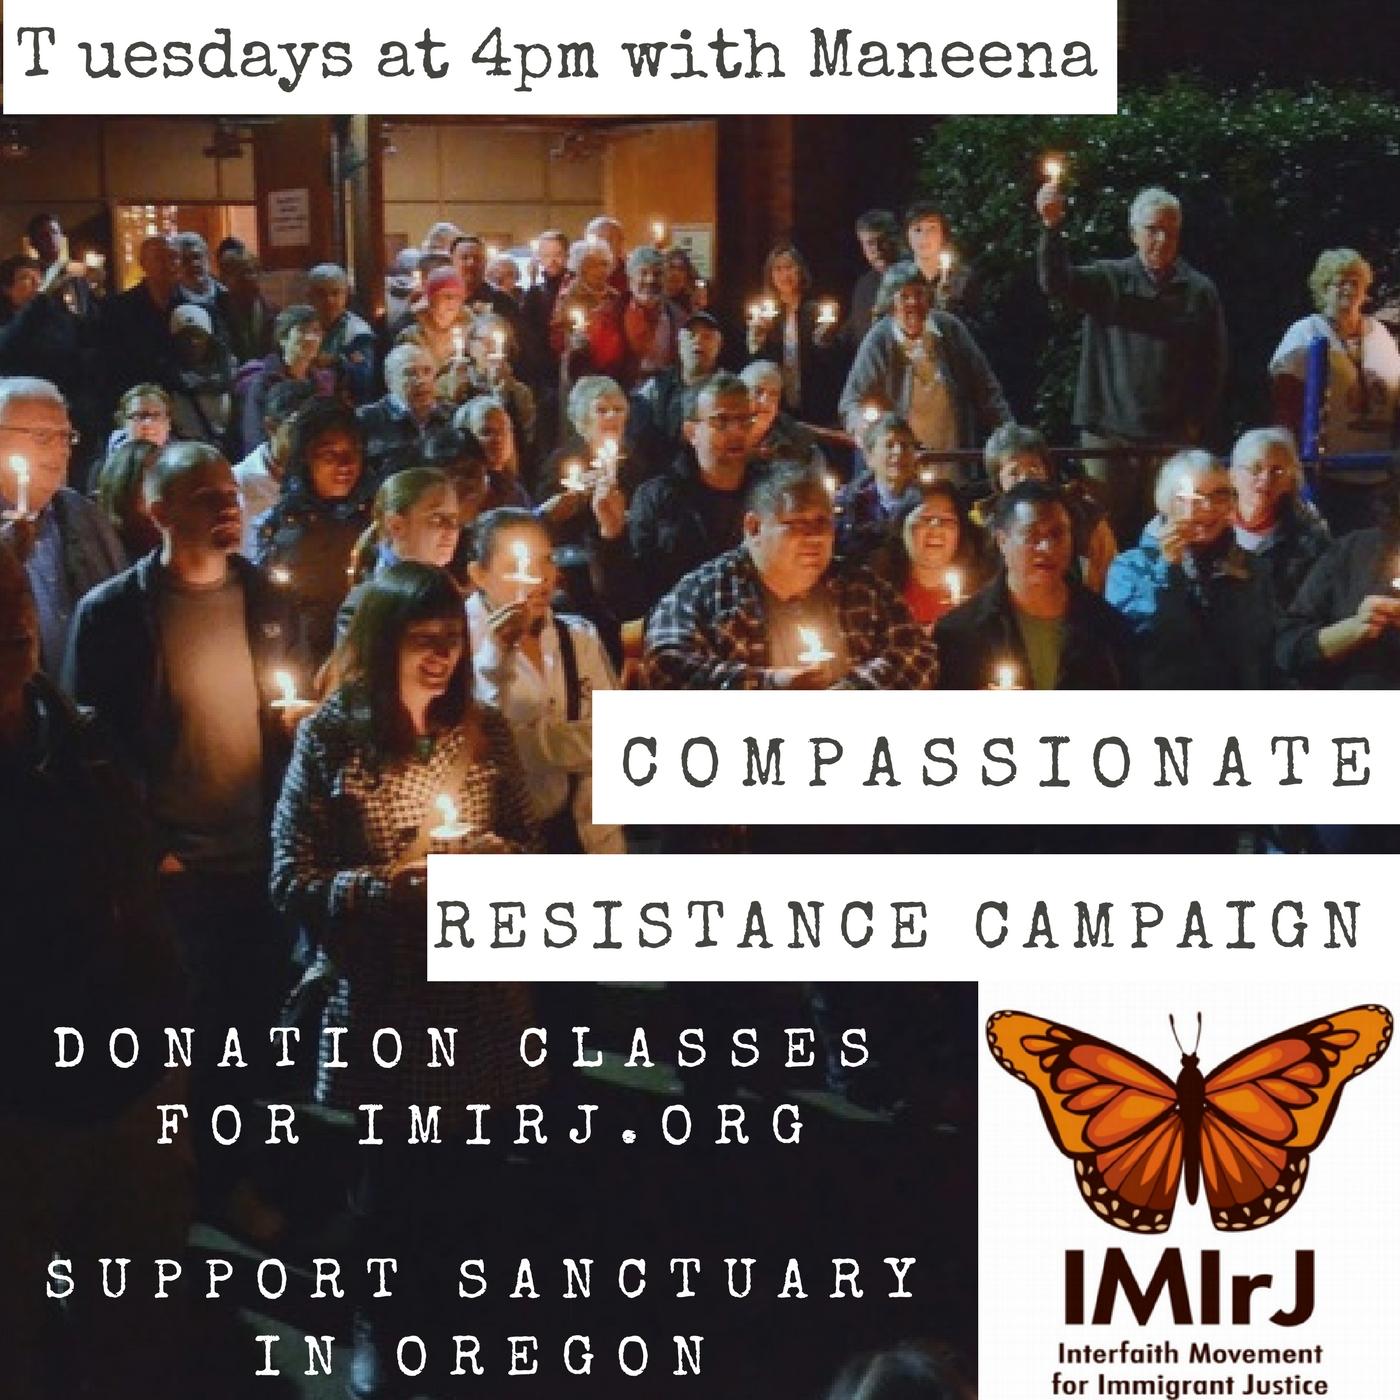 IMIRJ+Compassionate+Resistance+2018.jpg